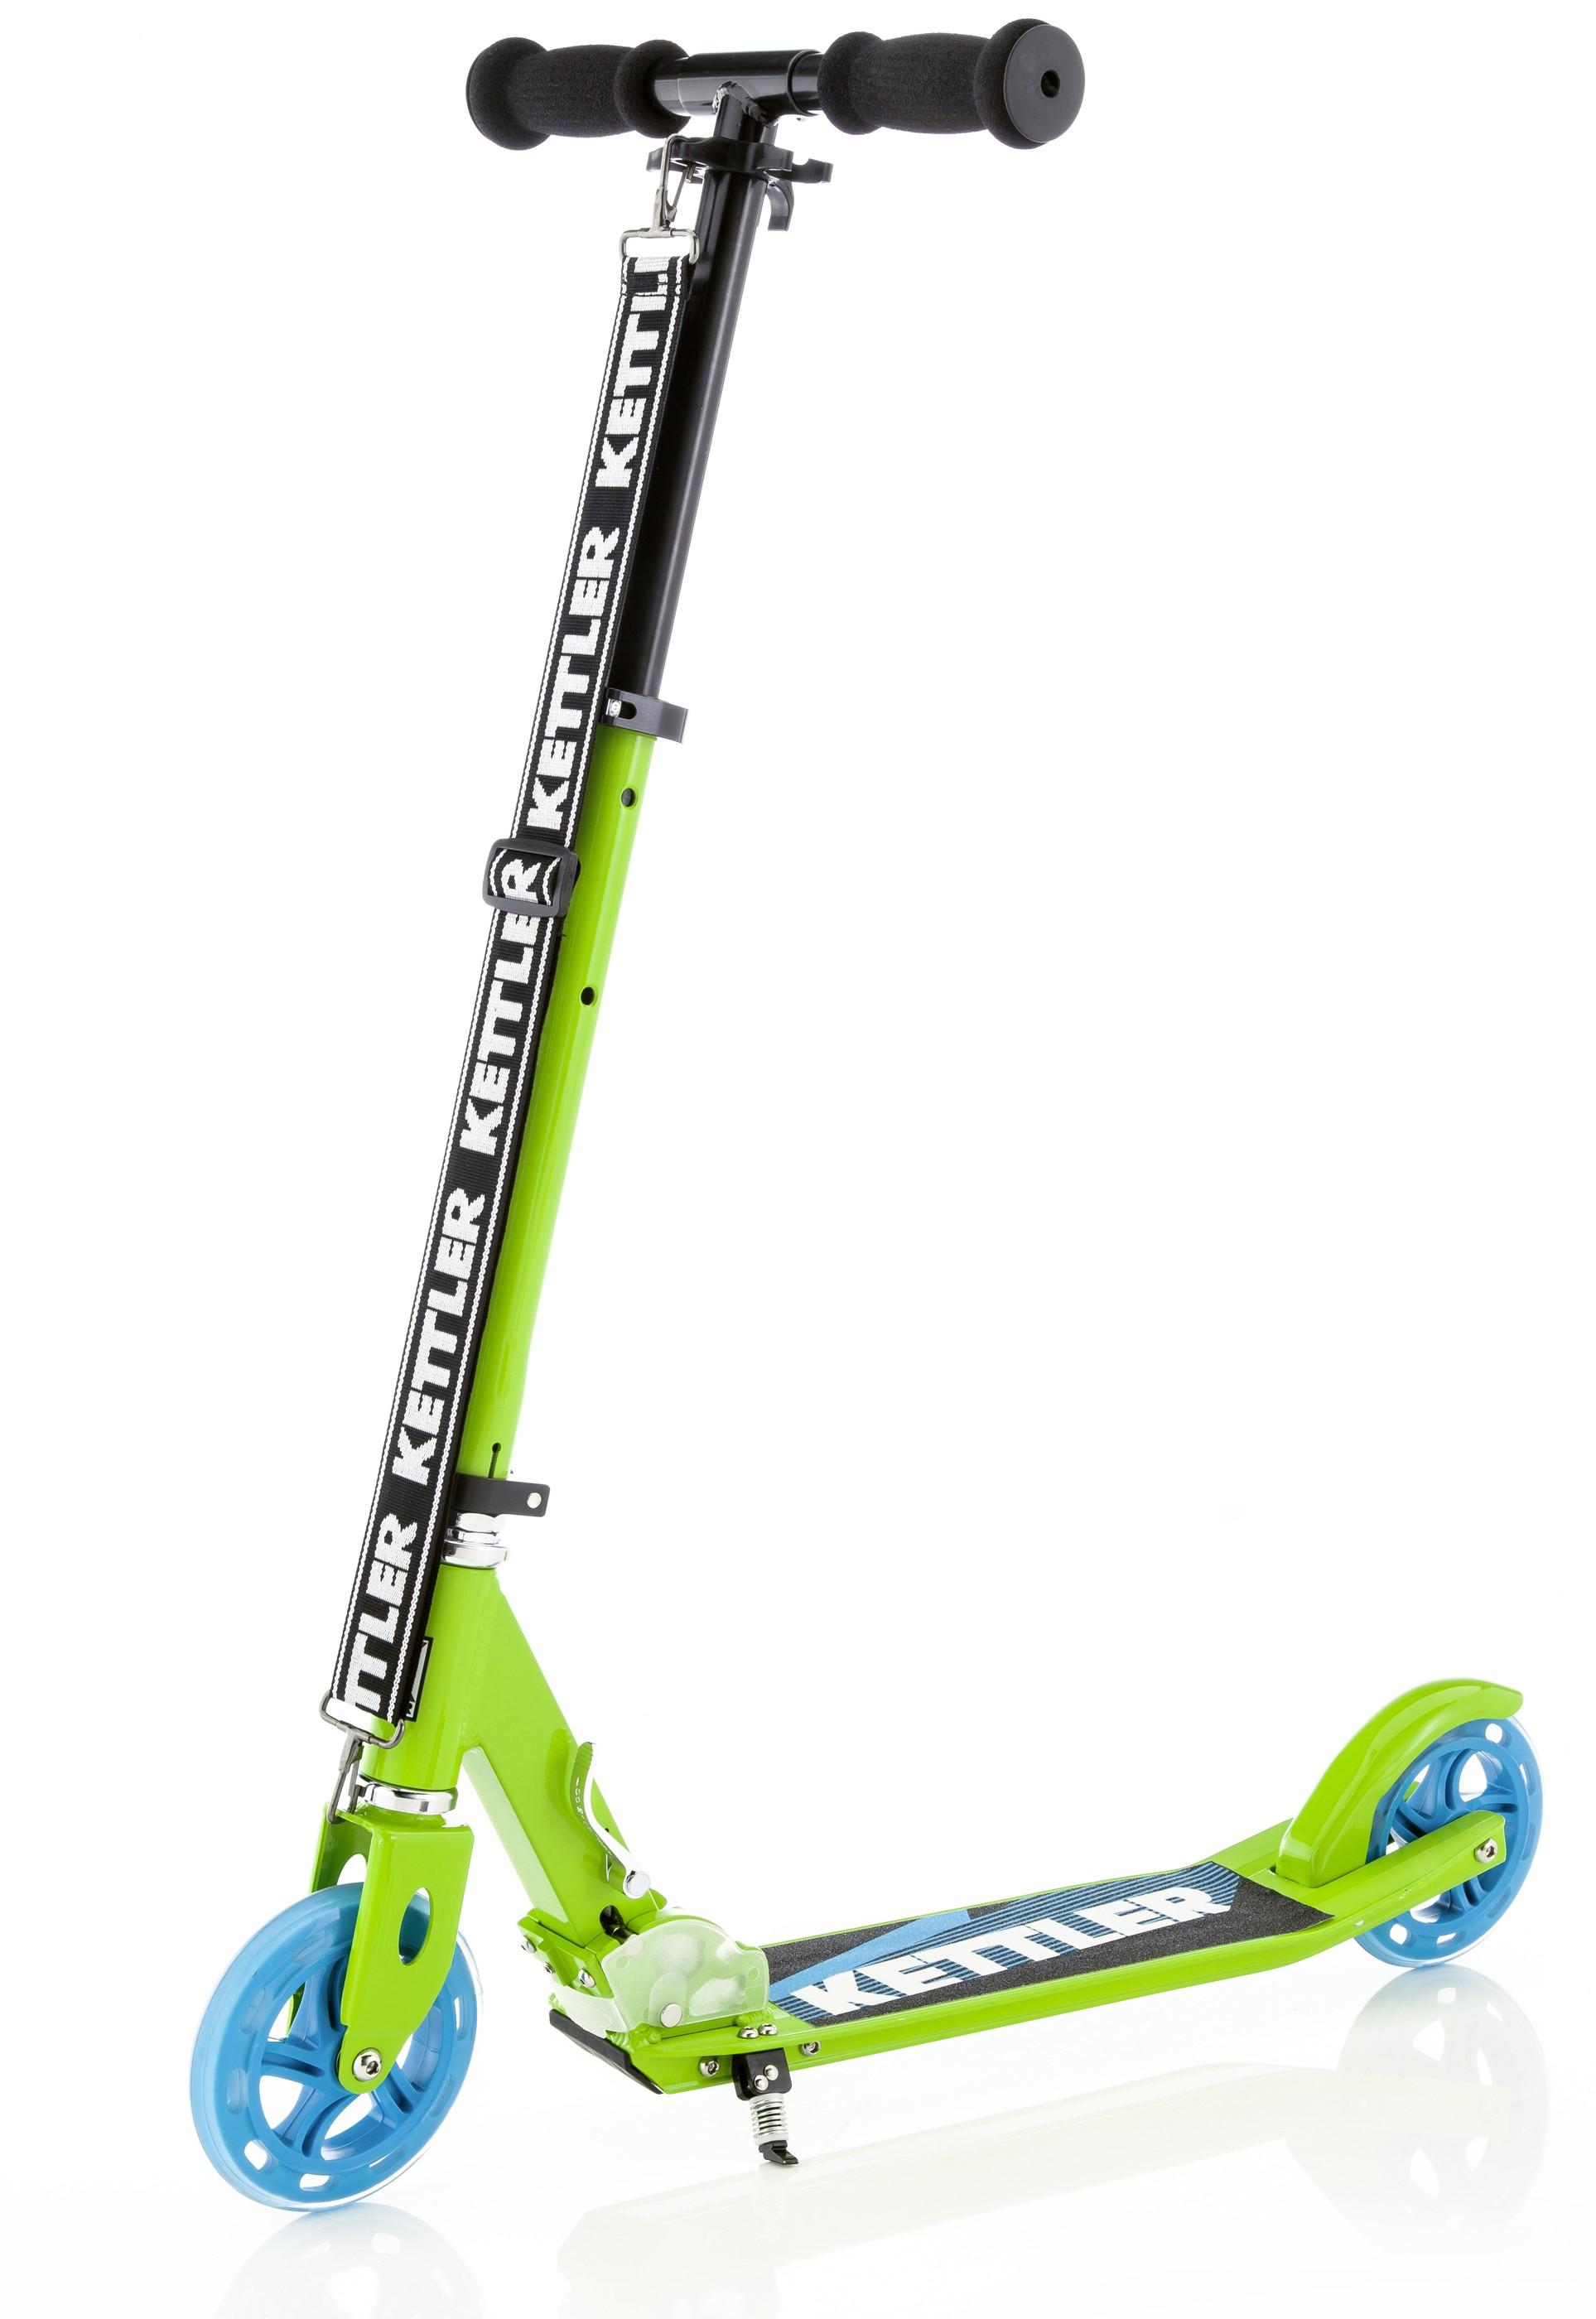 Kettler Tretroller, Scooter Zero 6 Greenatic / Cityroller T07115-5010 Bild 1